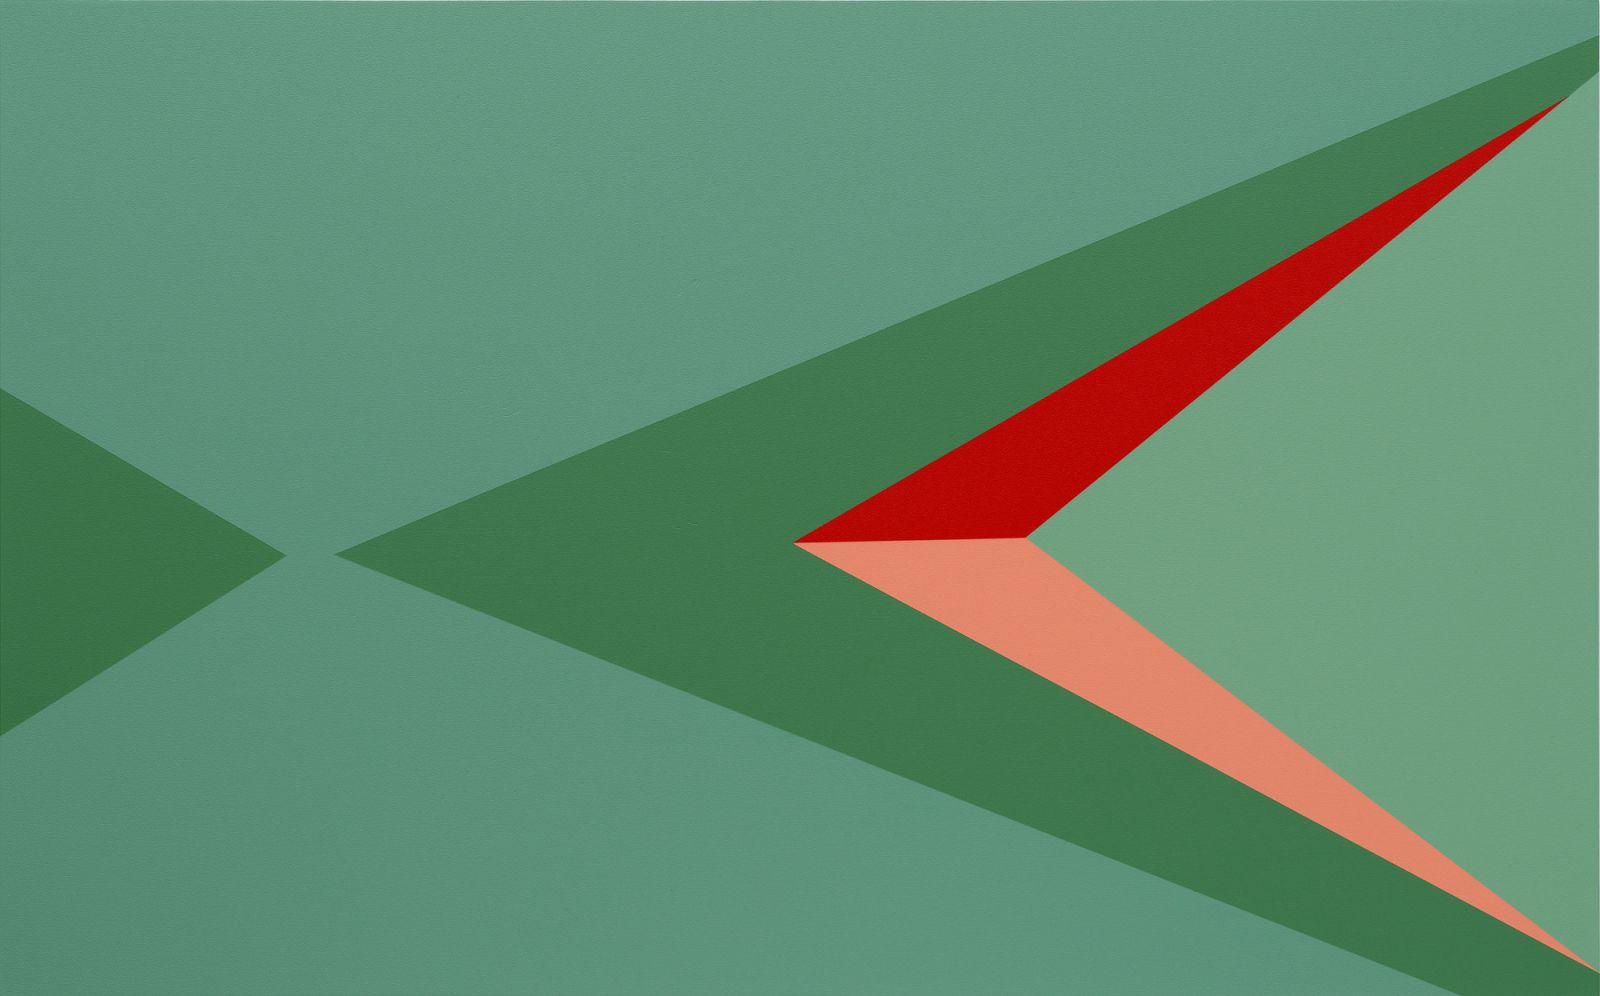 crocodile-dundee-acrylique-sur-contreplaque-ep22mm-58x93cm-18.02.19-redecoupee-25c96c0f6c0187700a1dae60b4e84e7e